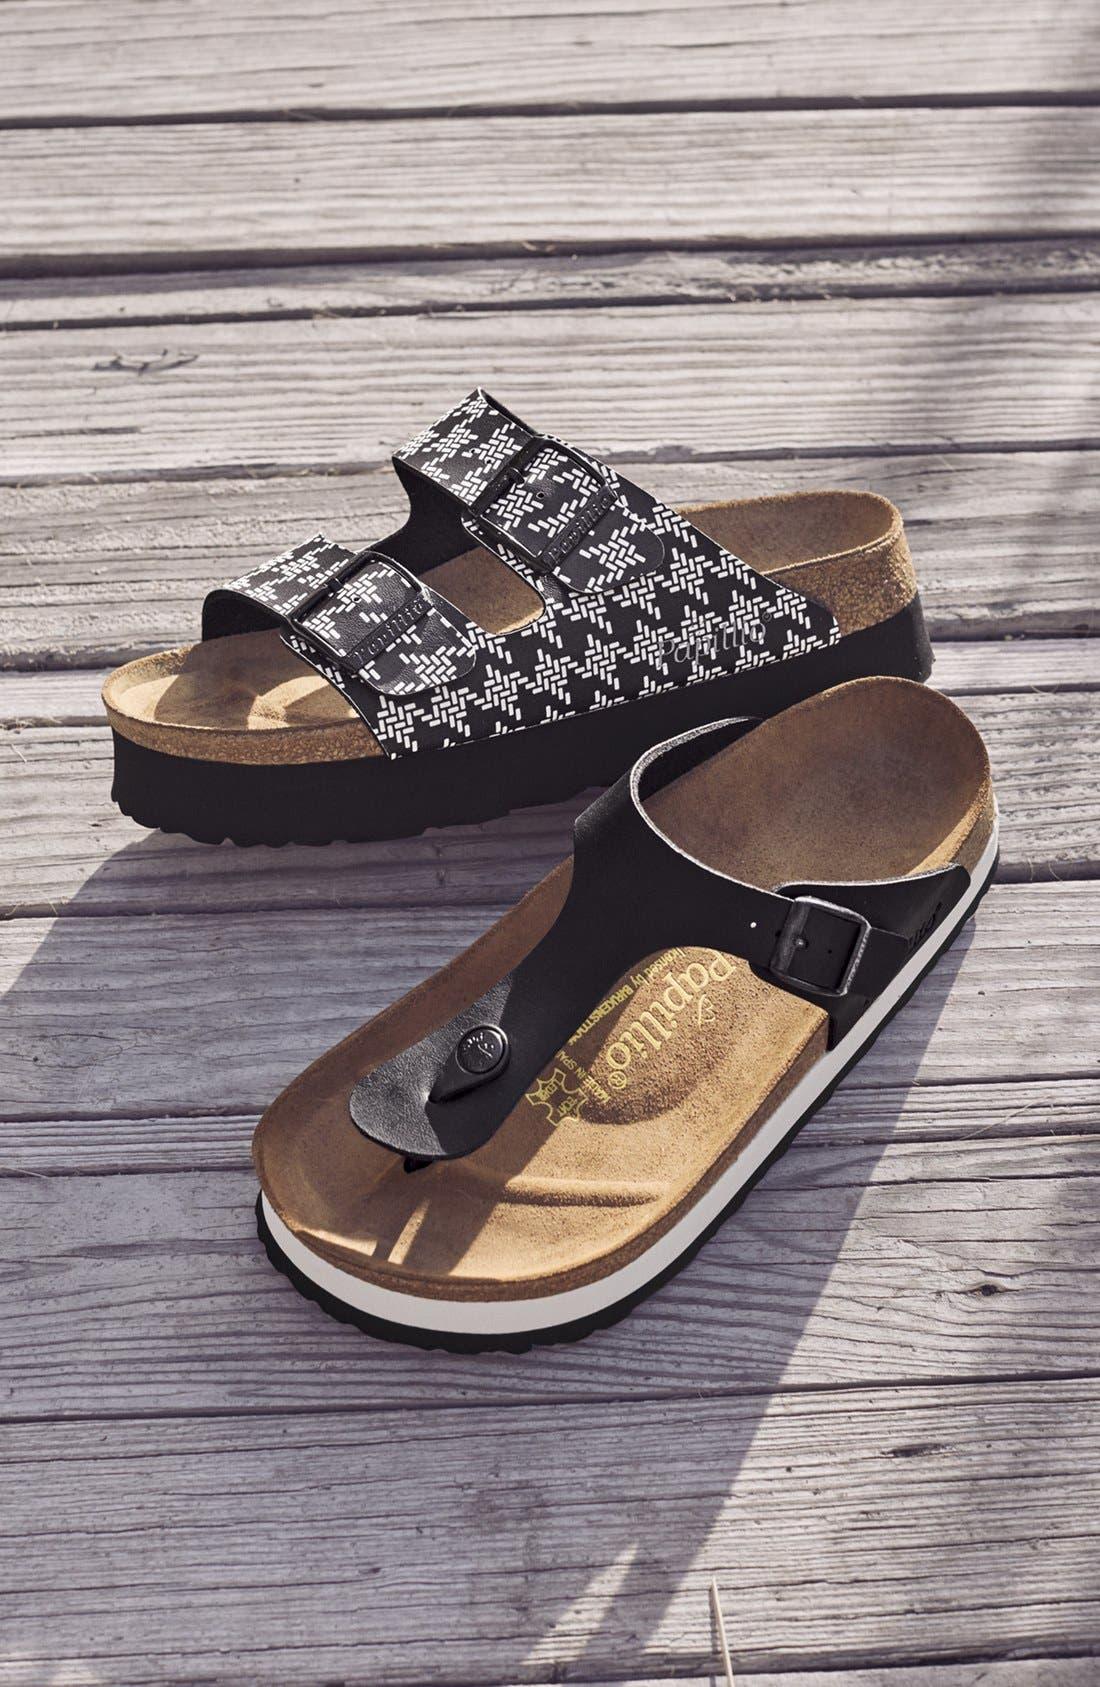 Papillio by Birkenstock 'Gizeh' Birko-Flor Platform Flip Flop Sandal,                             Alternate thumbnail 7, color,                             150